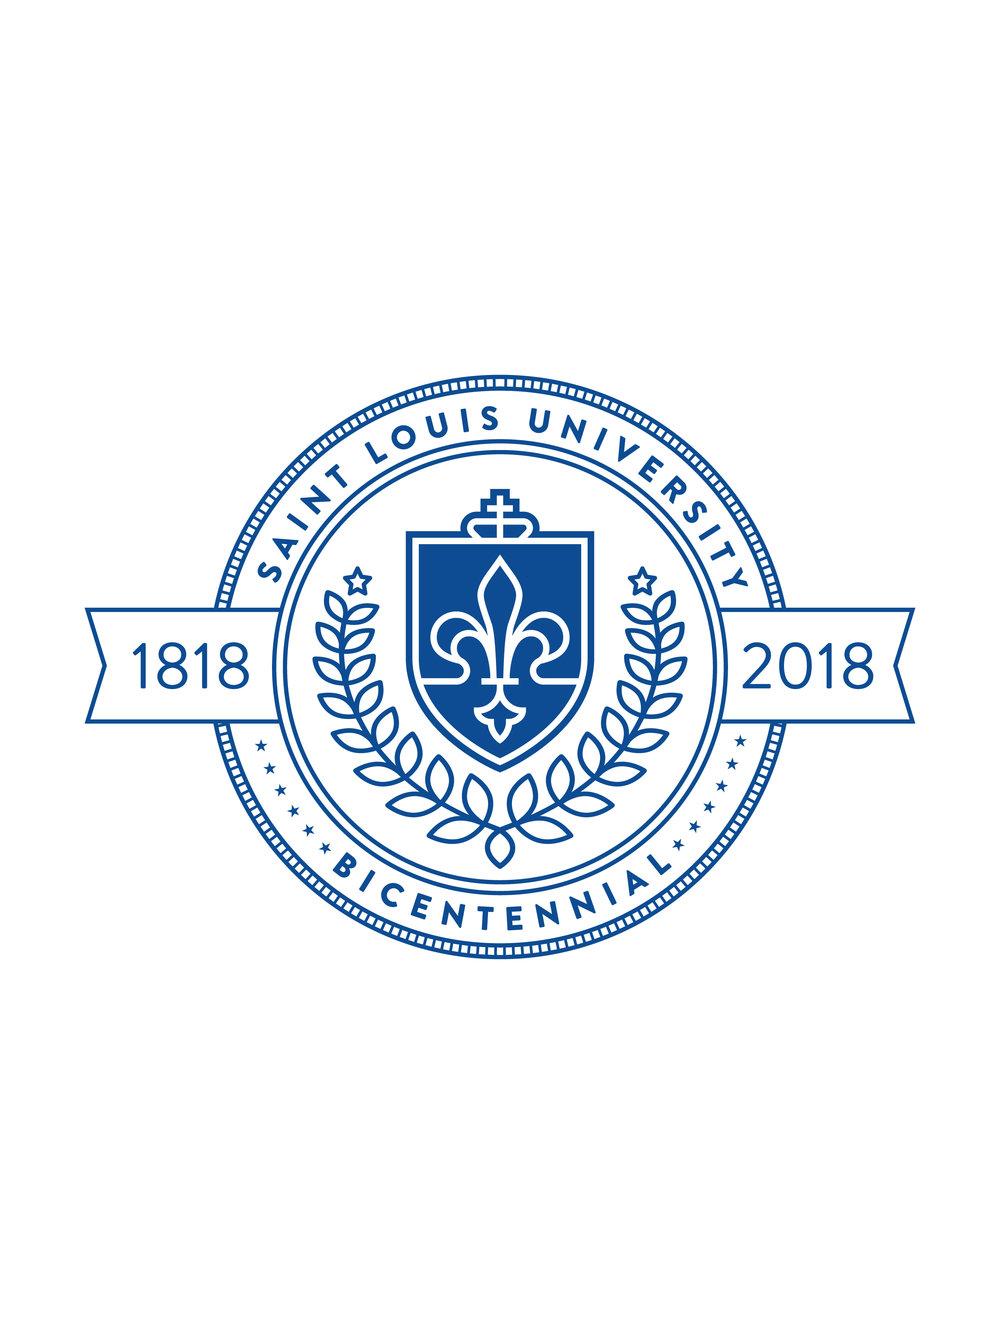 SLU_Bicentennial_Logo_Blue_FINAL.jpg